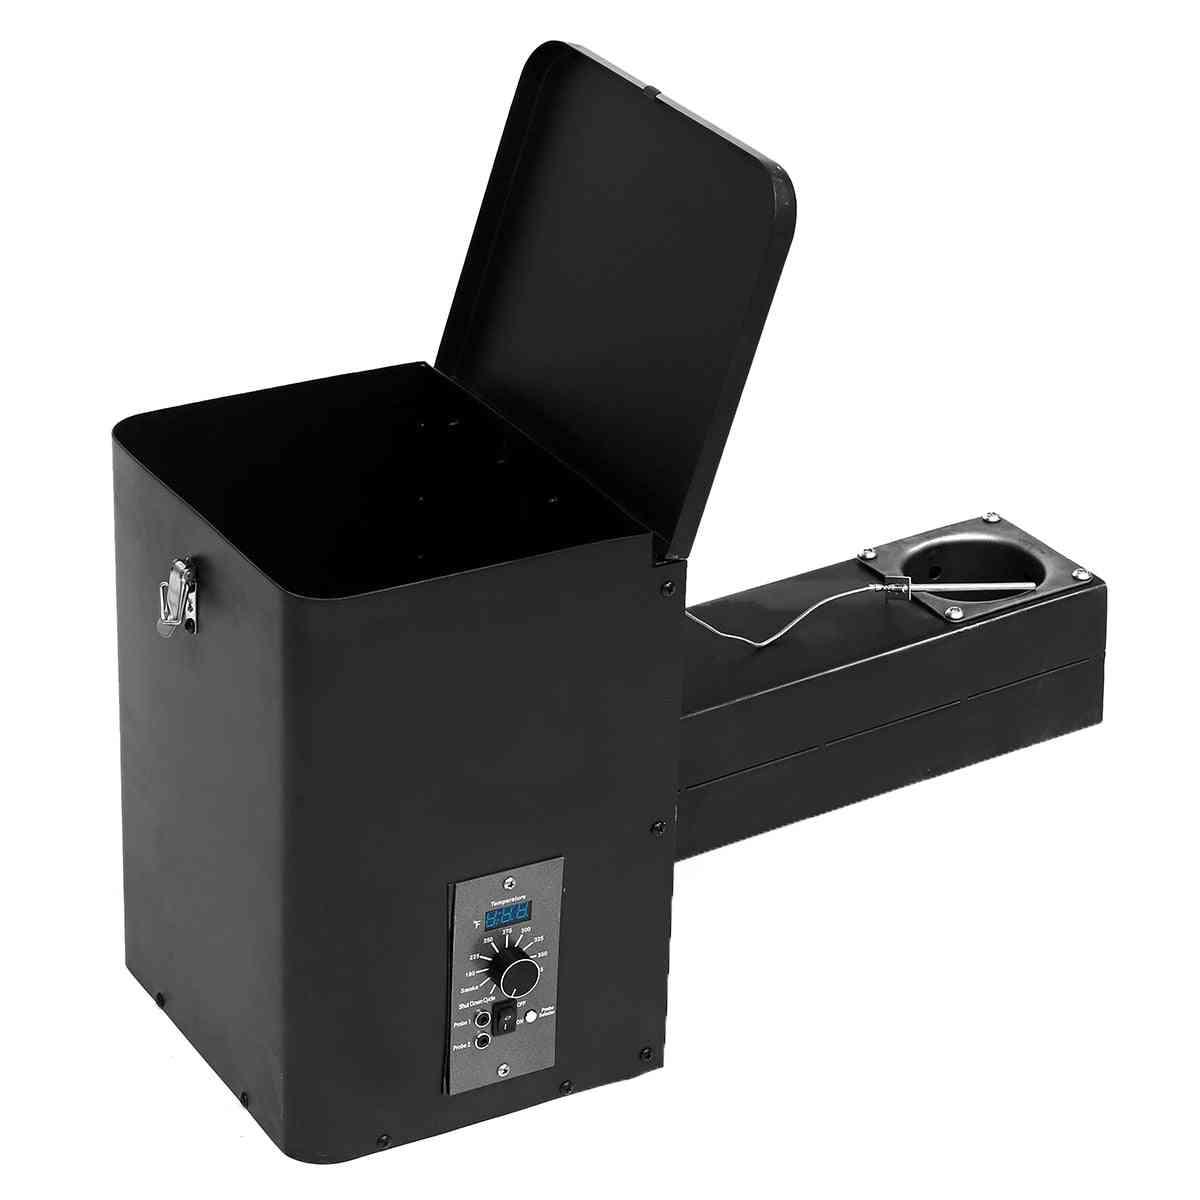 Digital Temperature Controller - Electric Wood Pellet Smoker Grill